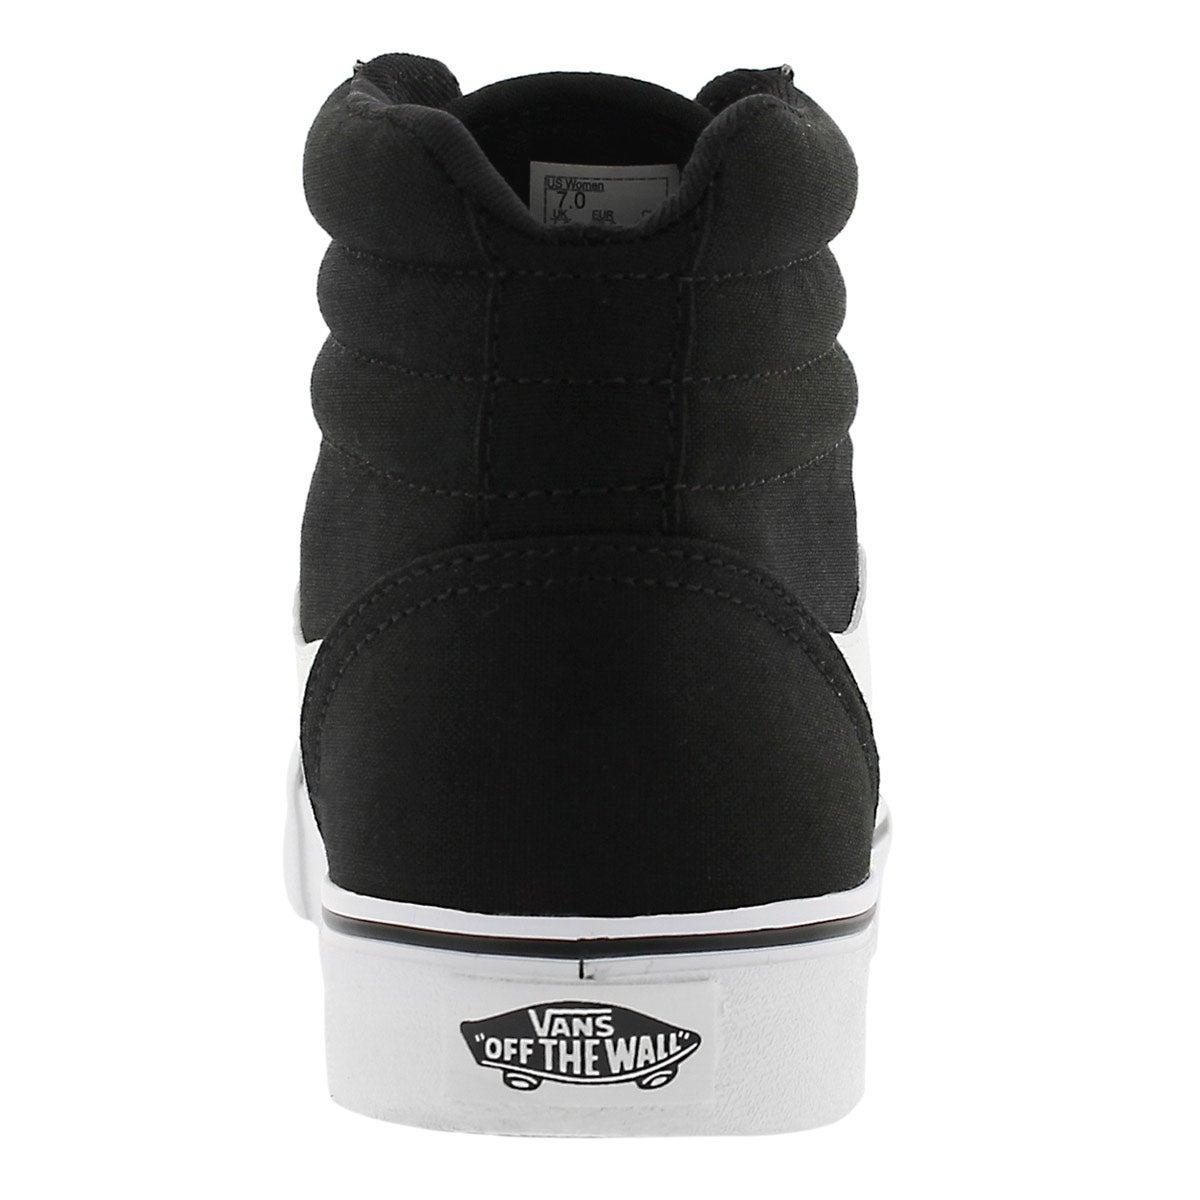 Lds Maddie Hi blk/wht laceup sneaker